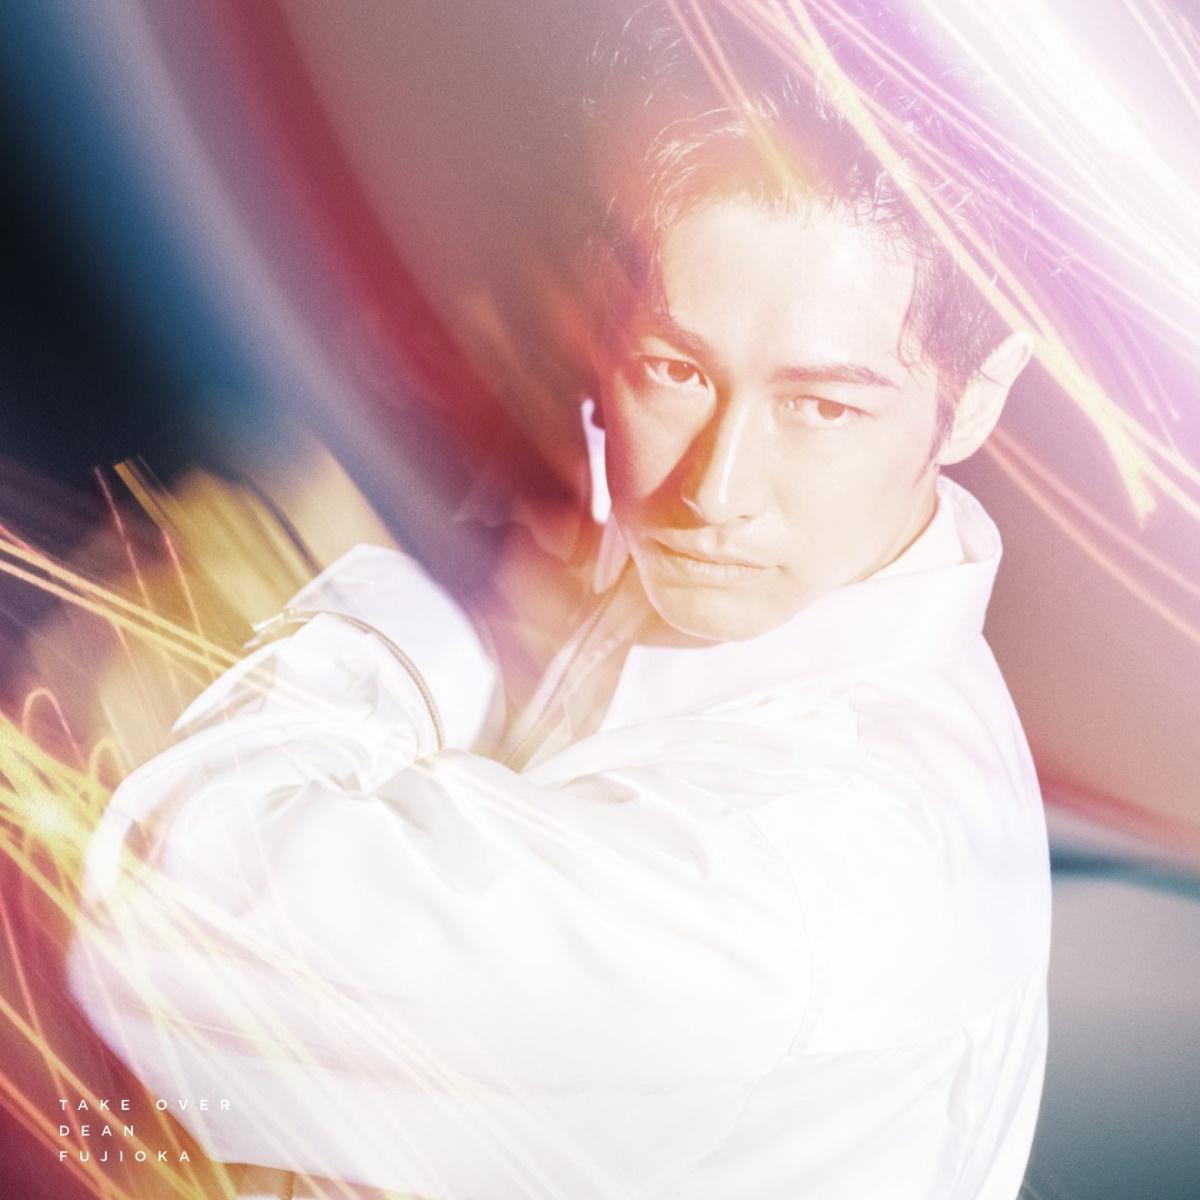 『DEAN FUJIOKA - Take Over』収録の『Take Over』ジャケット